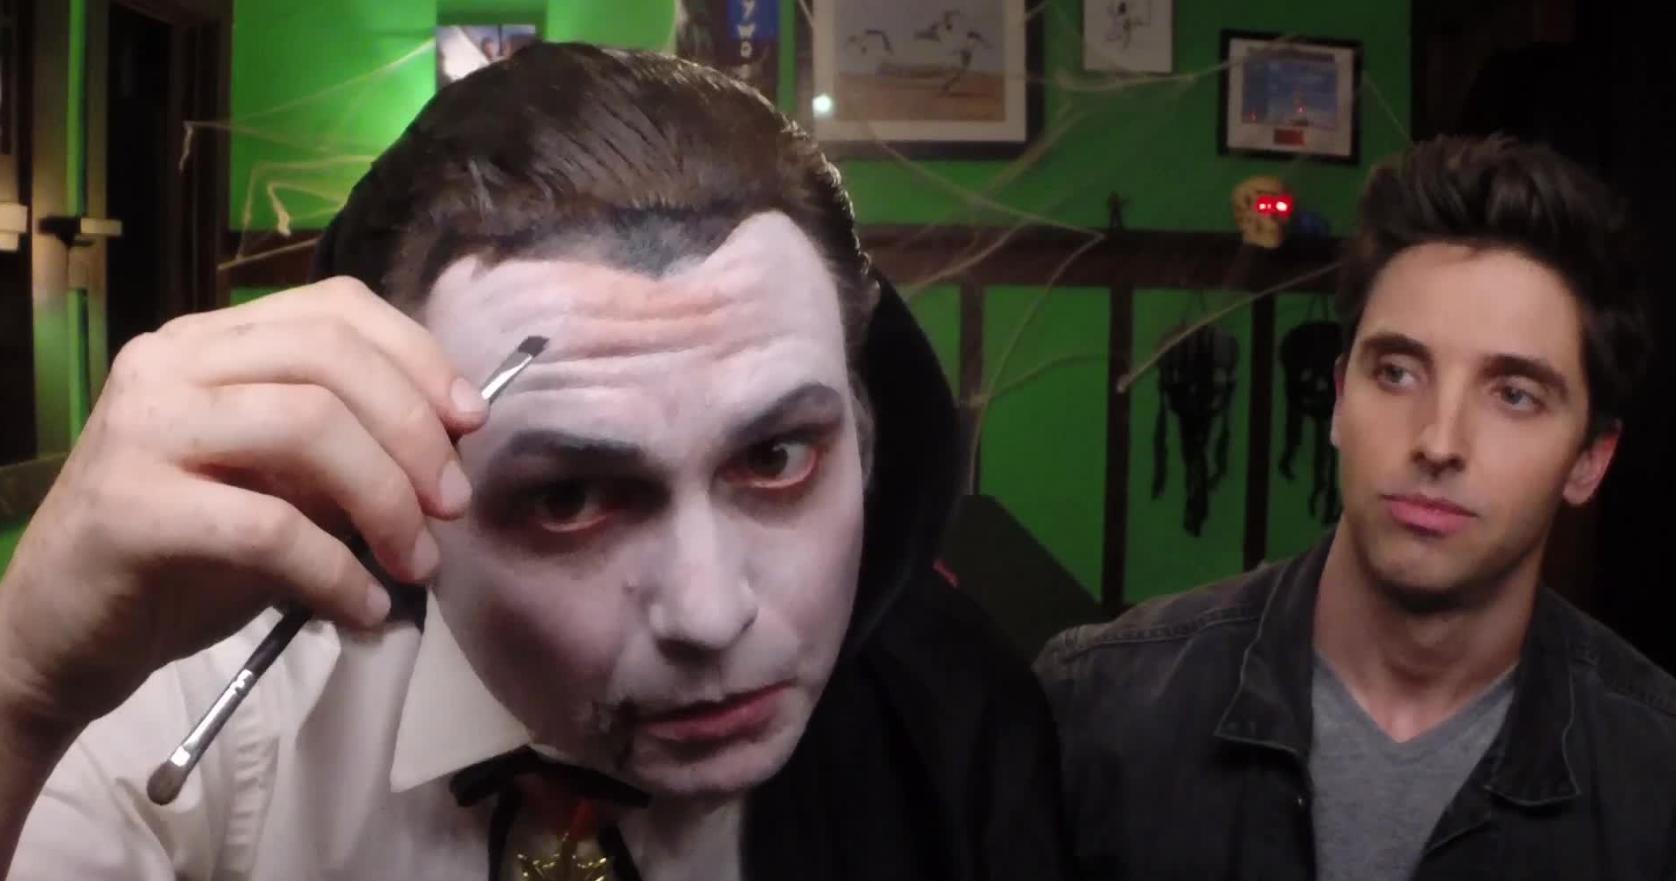 Trucco Halloween Vampiro Uomo.Trucco Halloween Uomo Vampiro Zombie Scheletro E Altre Idee